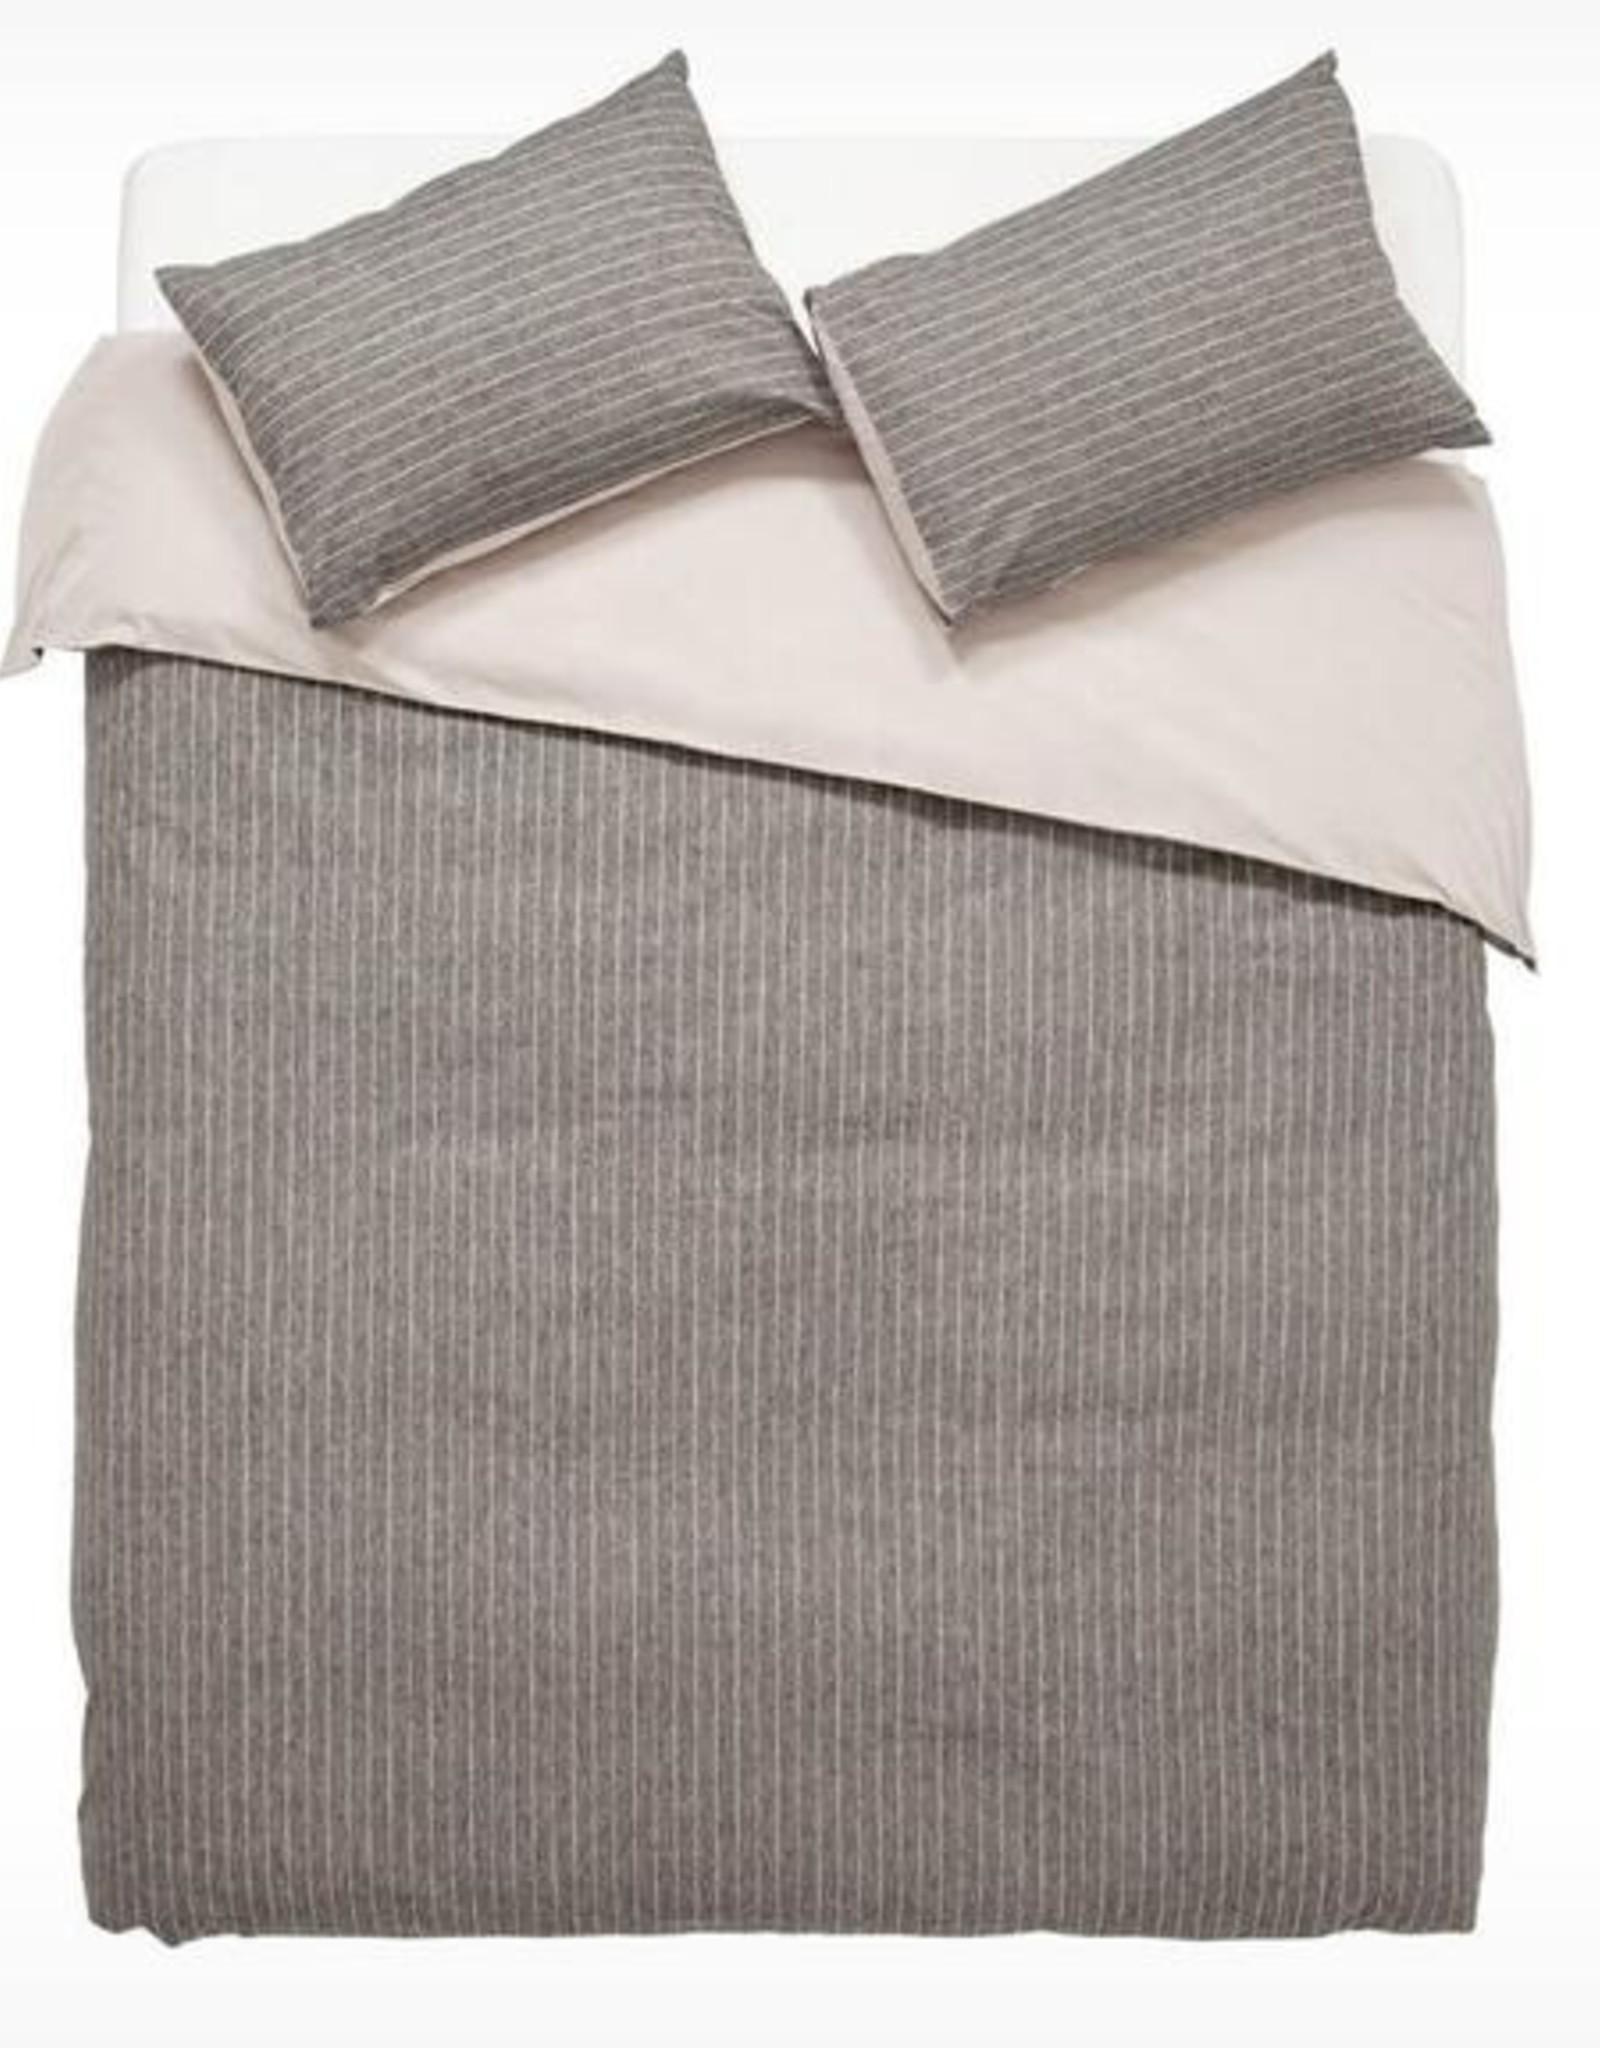 EQ3 EQ3 Acadia Duvet Set-King-Grey